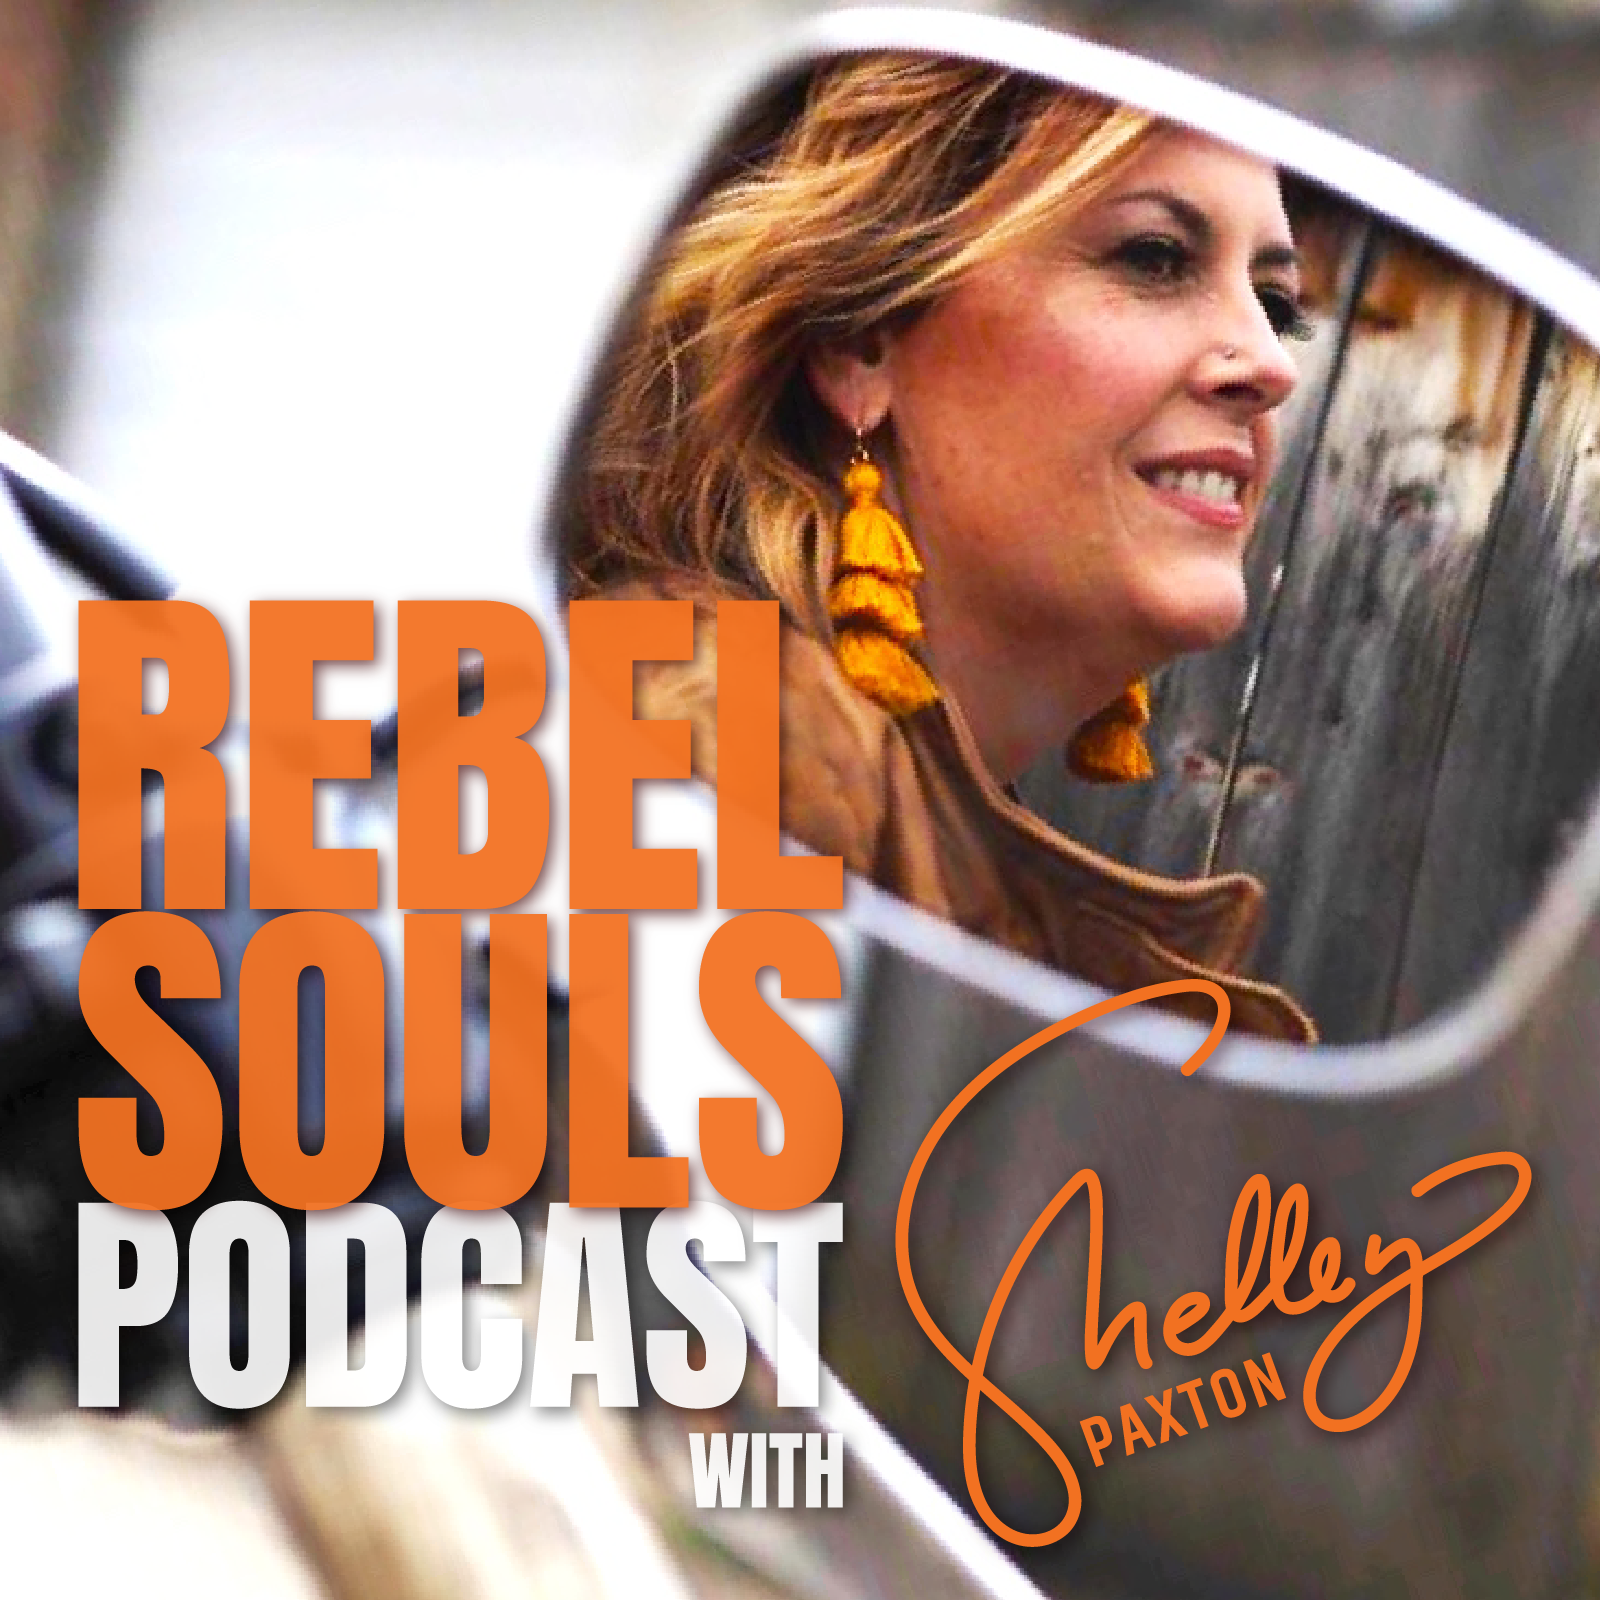 Rebel Souls' Podcast show art